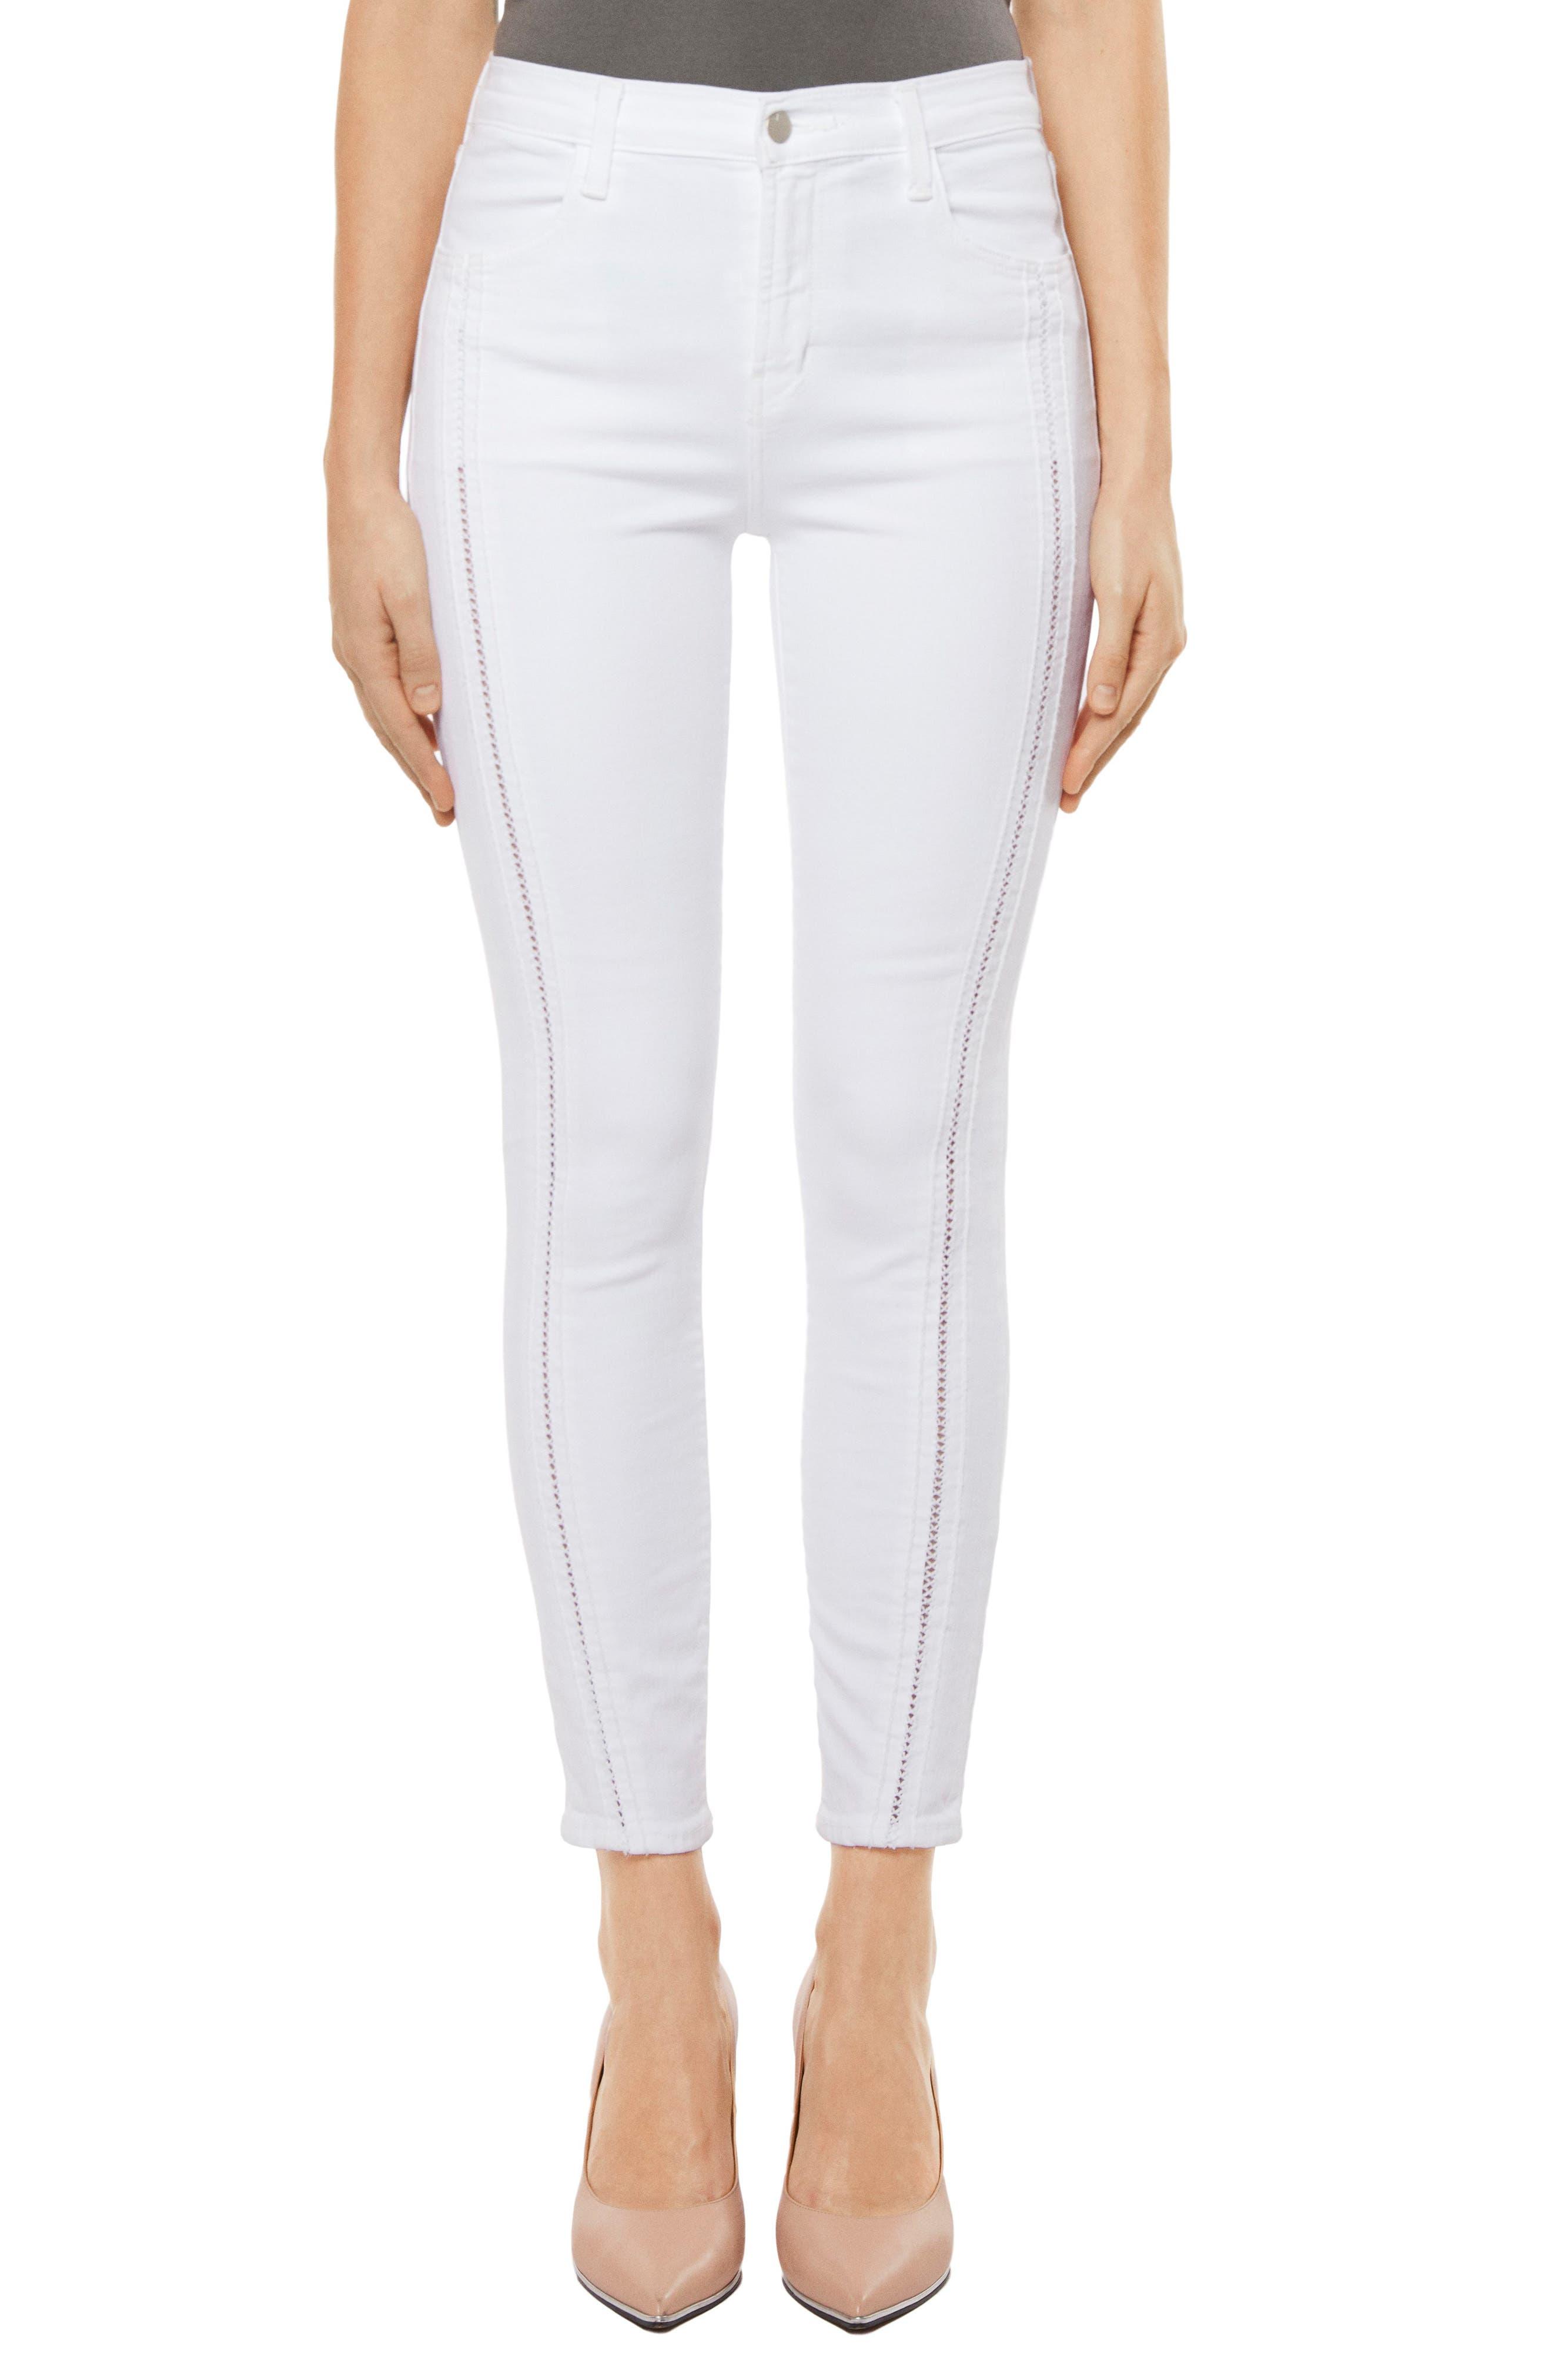 Alana High Waist Crop Skinny Jeans,                             Main thumbnail 1, color,                             160